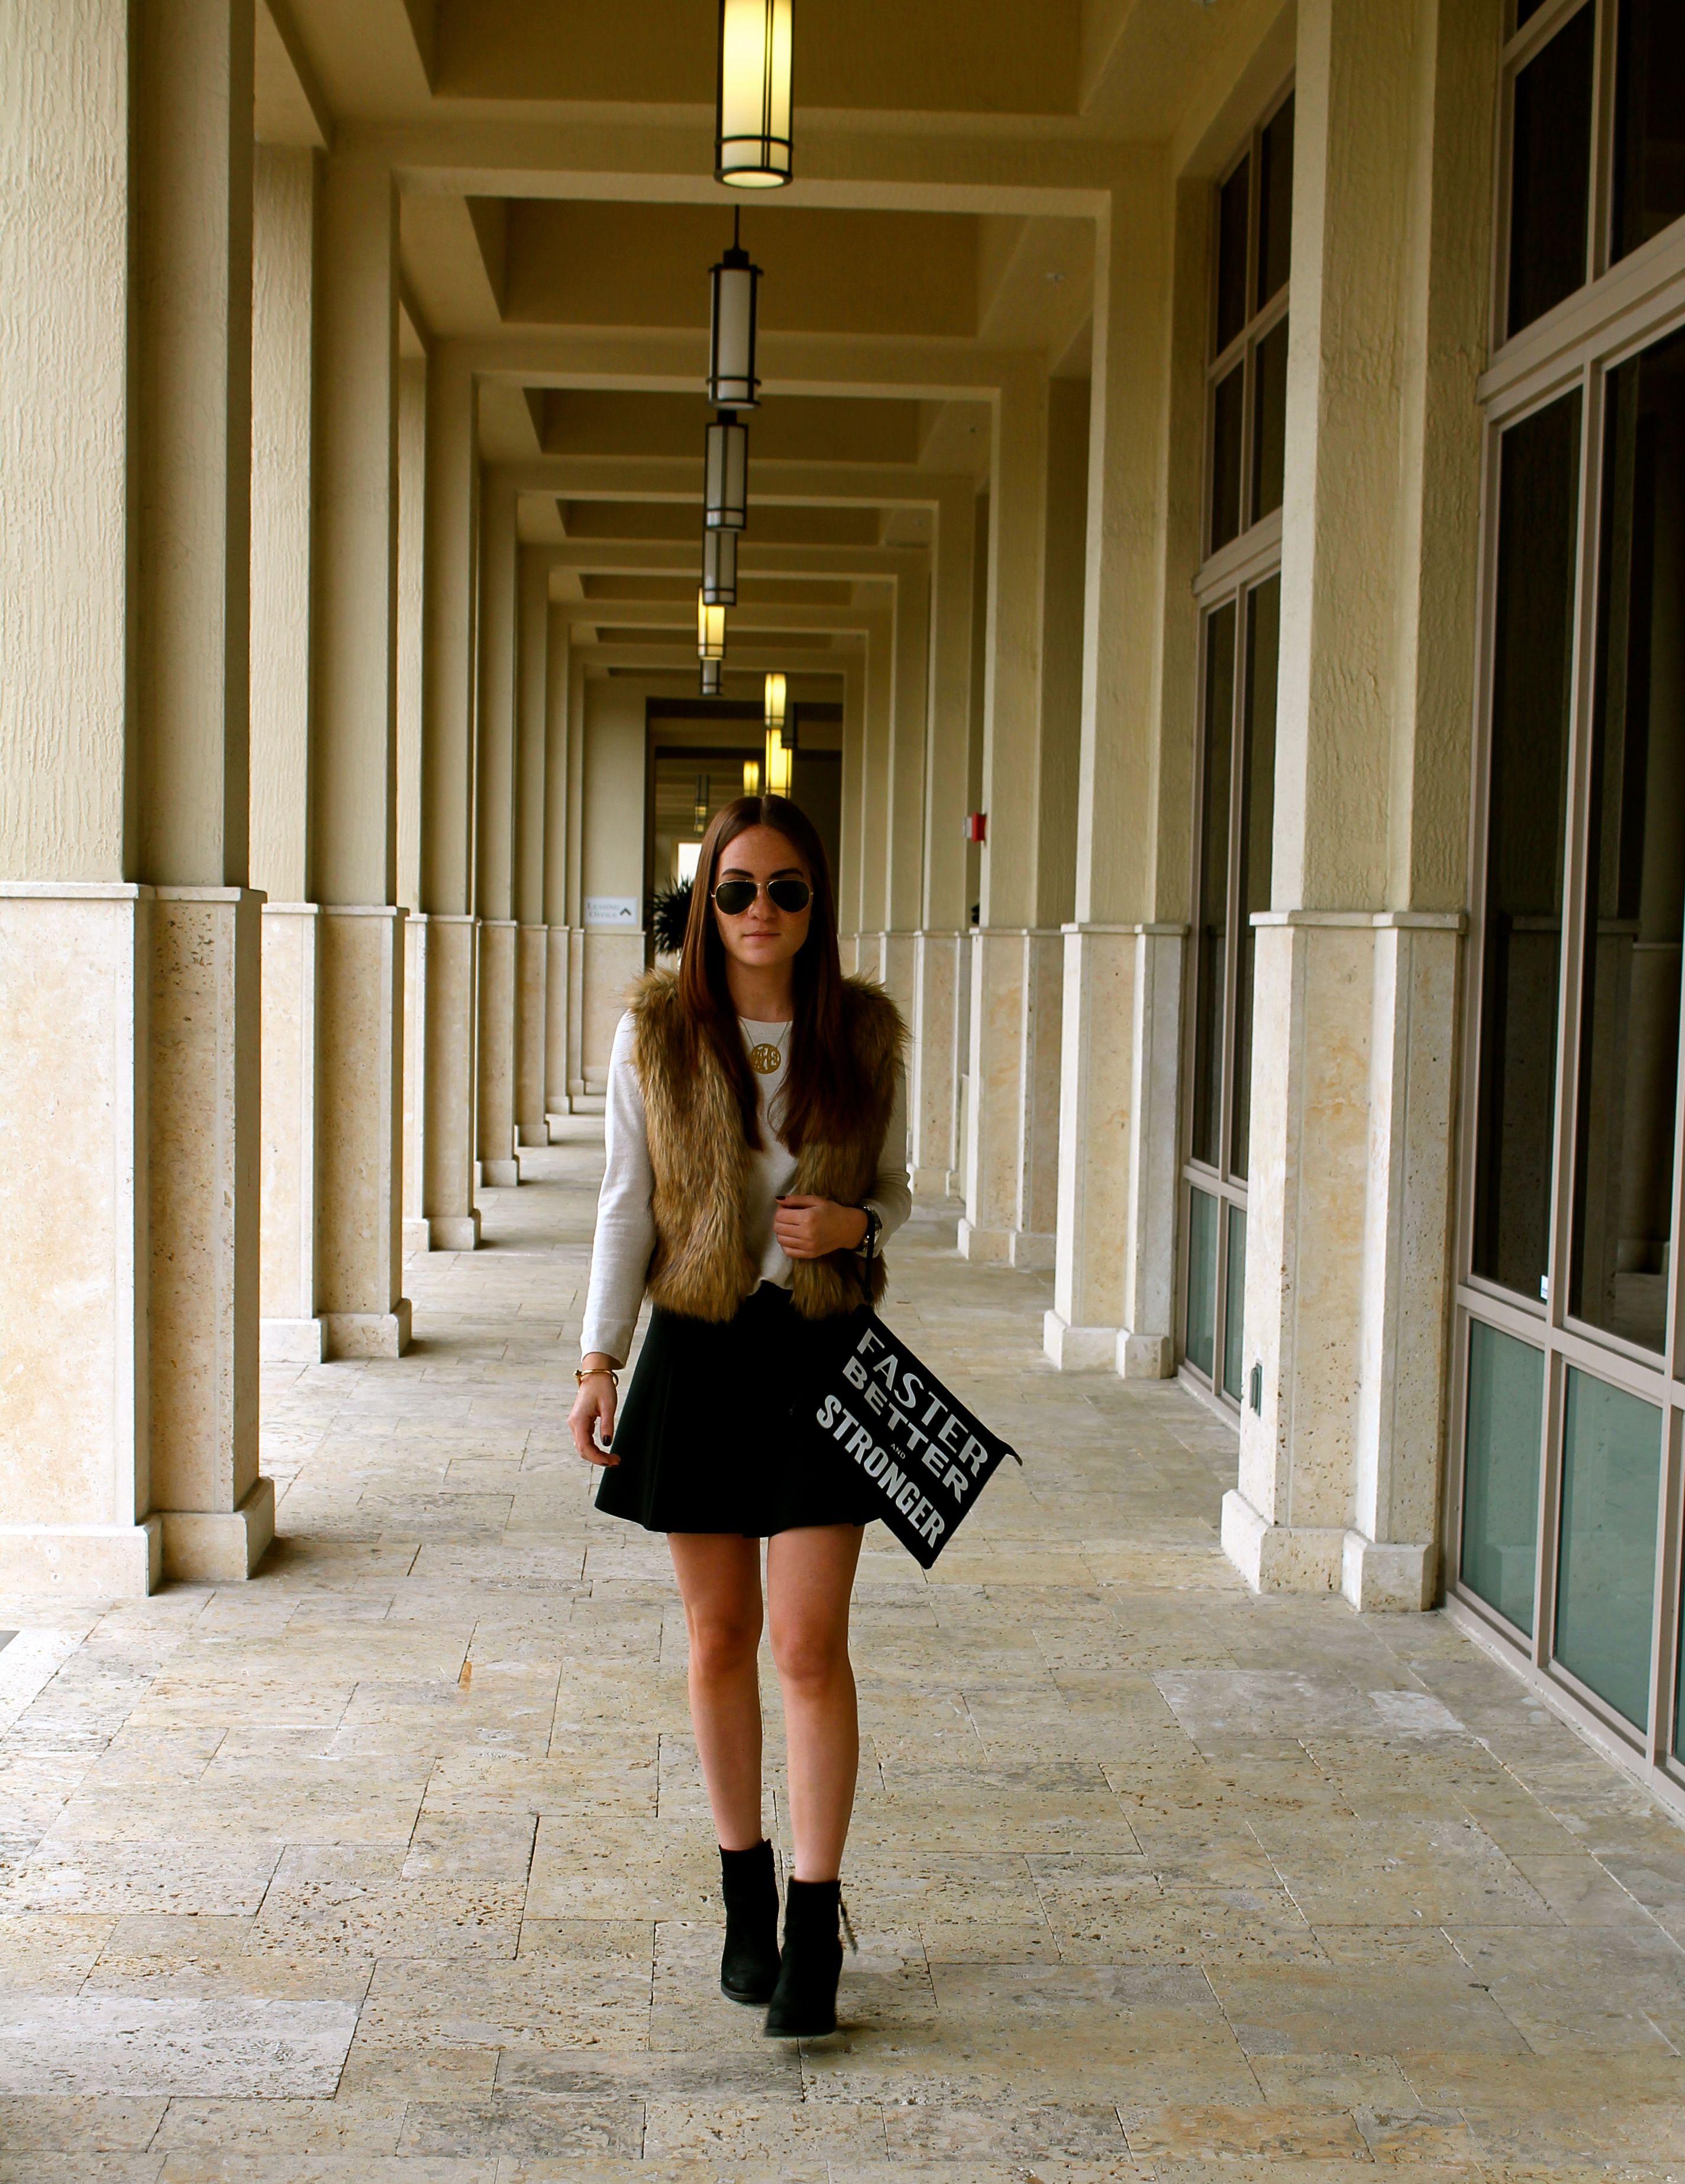 #fashion #blogger #fashionblogger #stylebytwo #fur #furvest #zara #circleskirt #stevemadden #booties #fasterbetterstronger #clutch #rayban #michaelkors #davidyurman